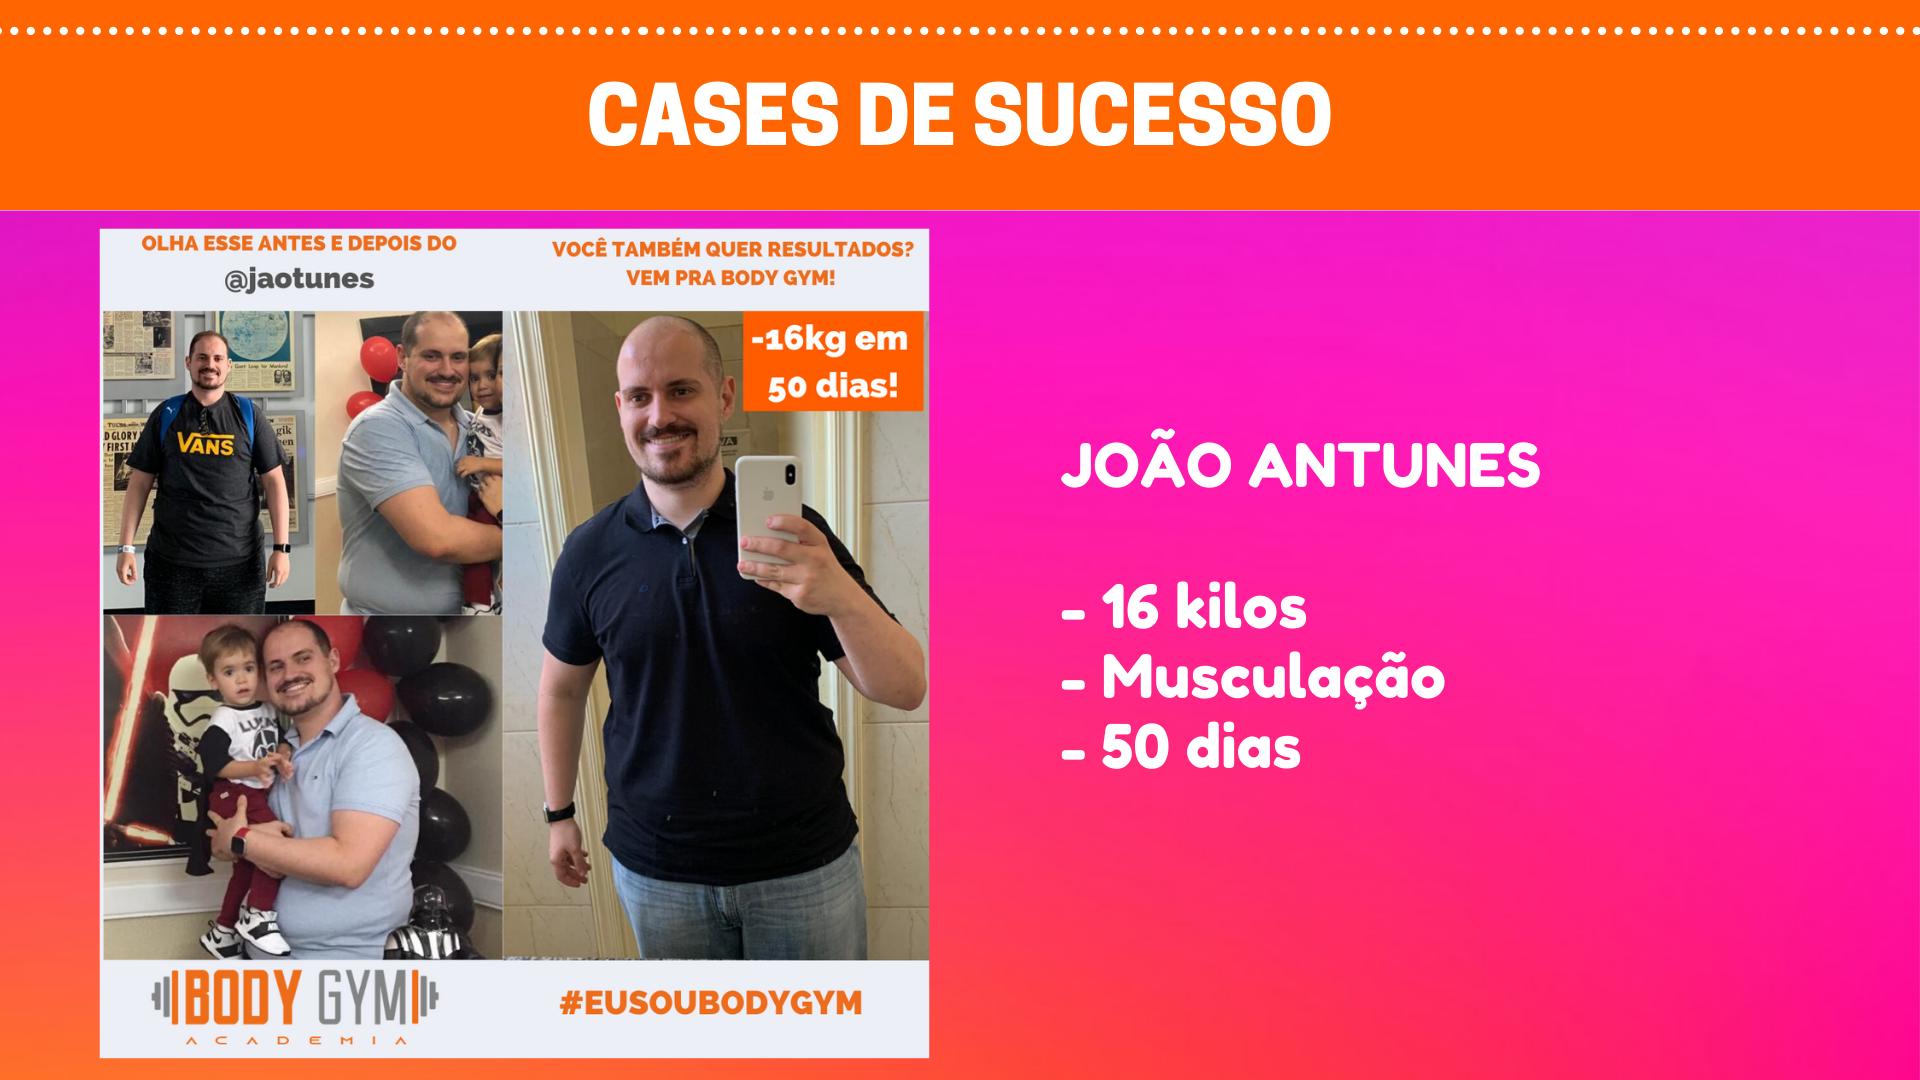 João Antunes